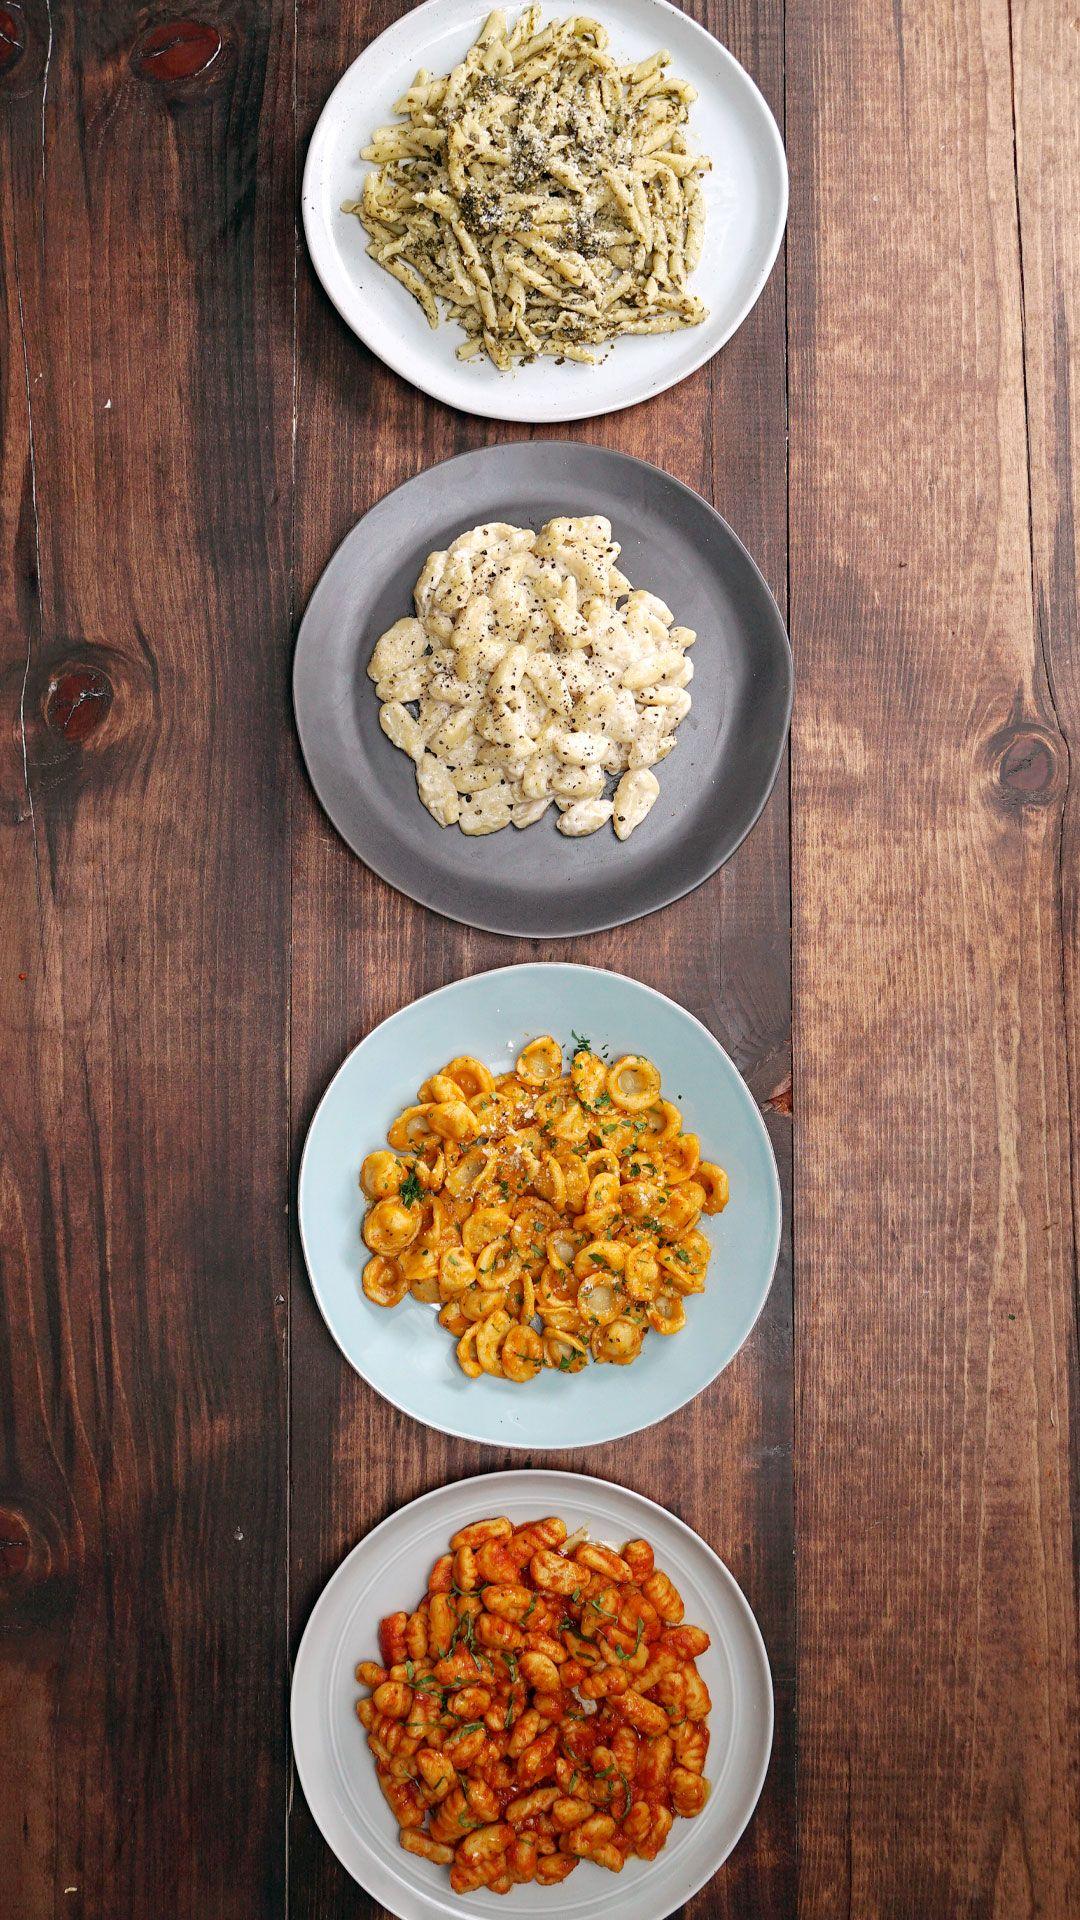 Photo of Basic Pasta – Shaping Pasta With 4 Common Kitchen Utensils